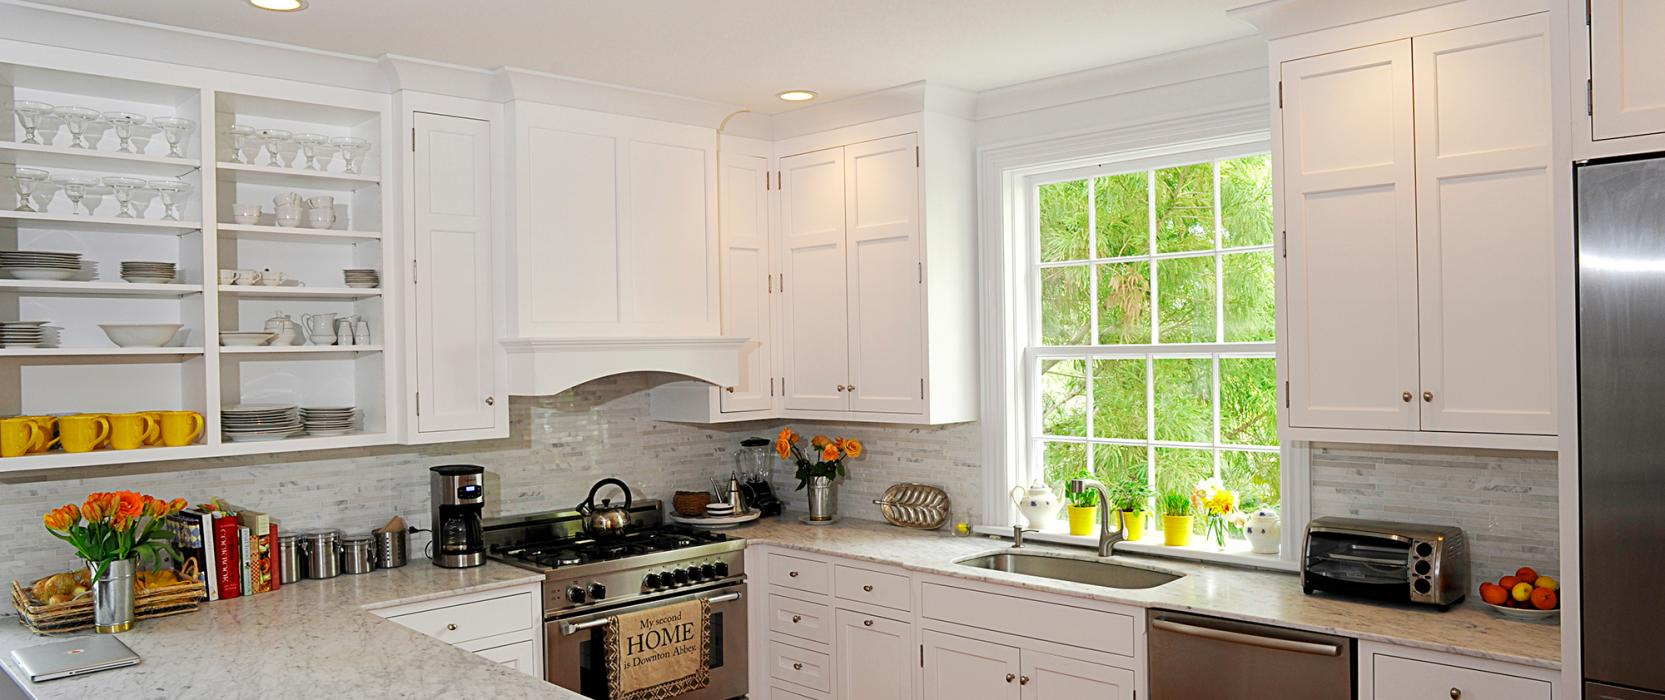 Rock pond kitchens